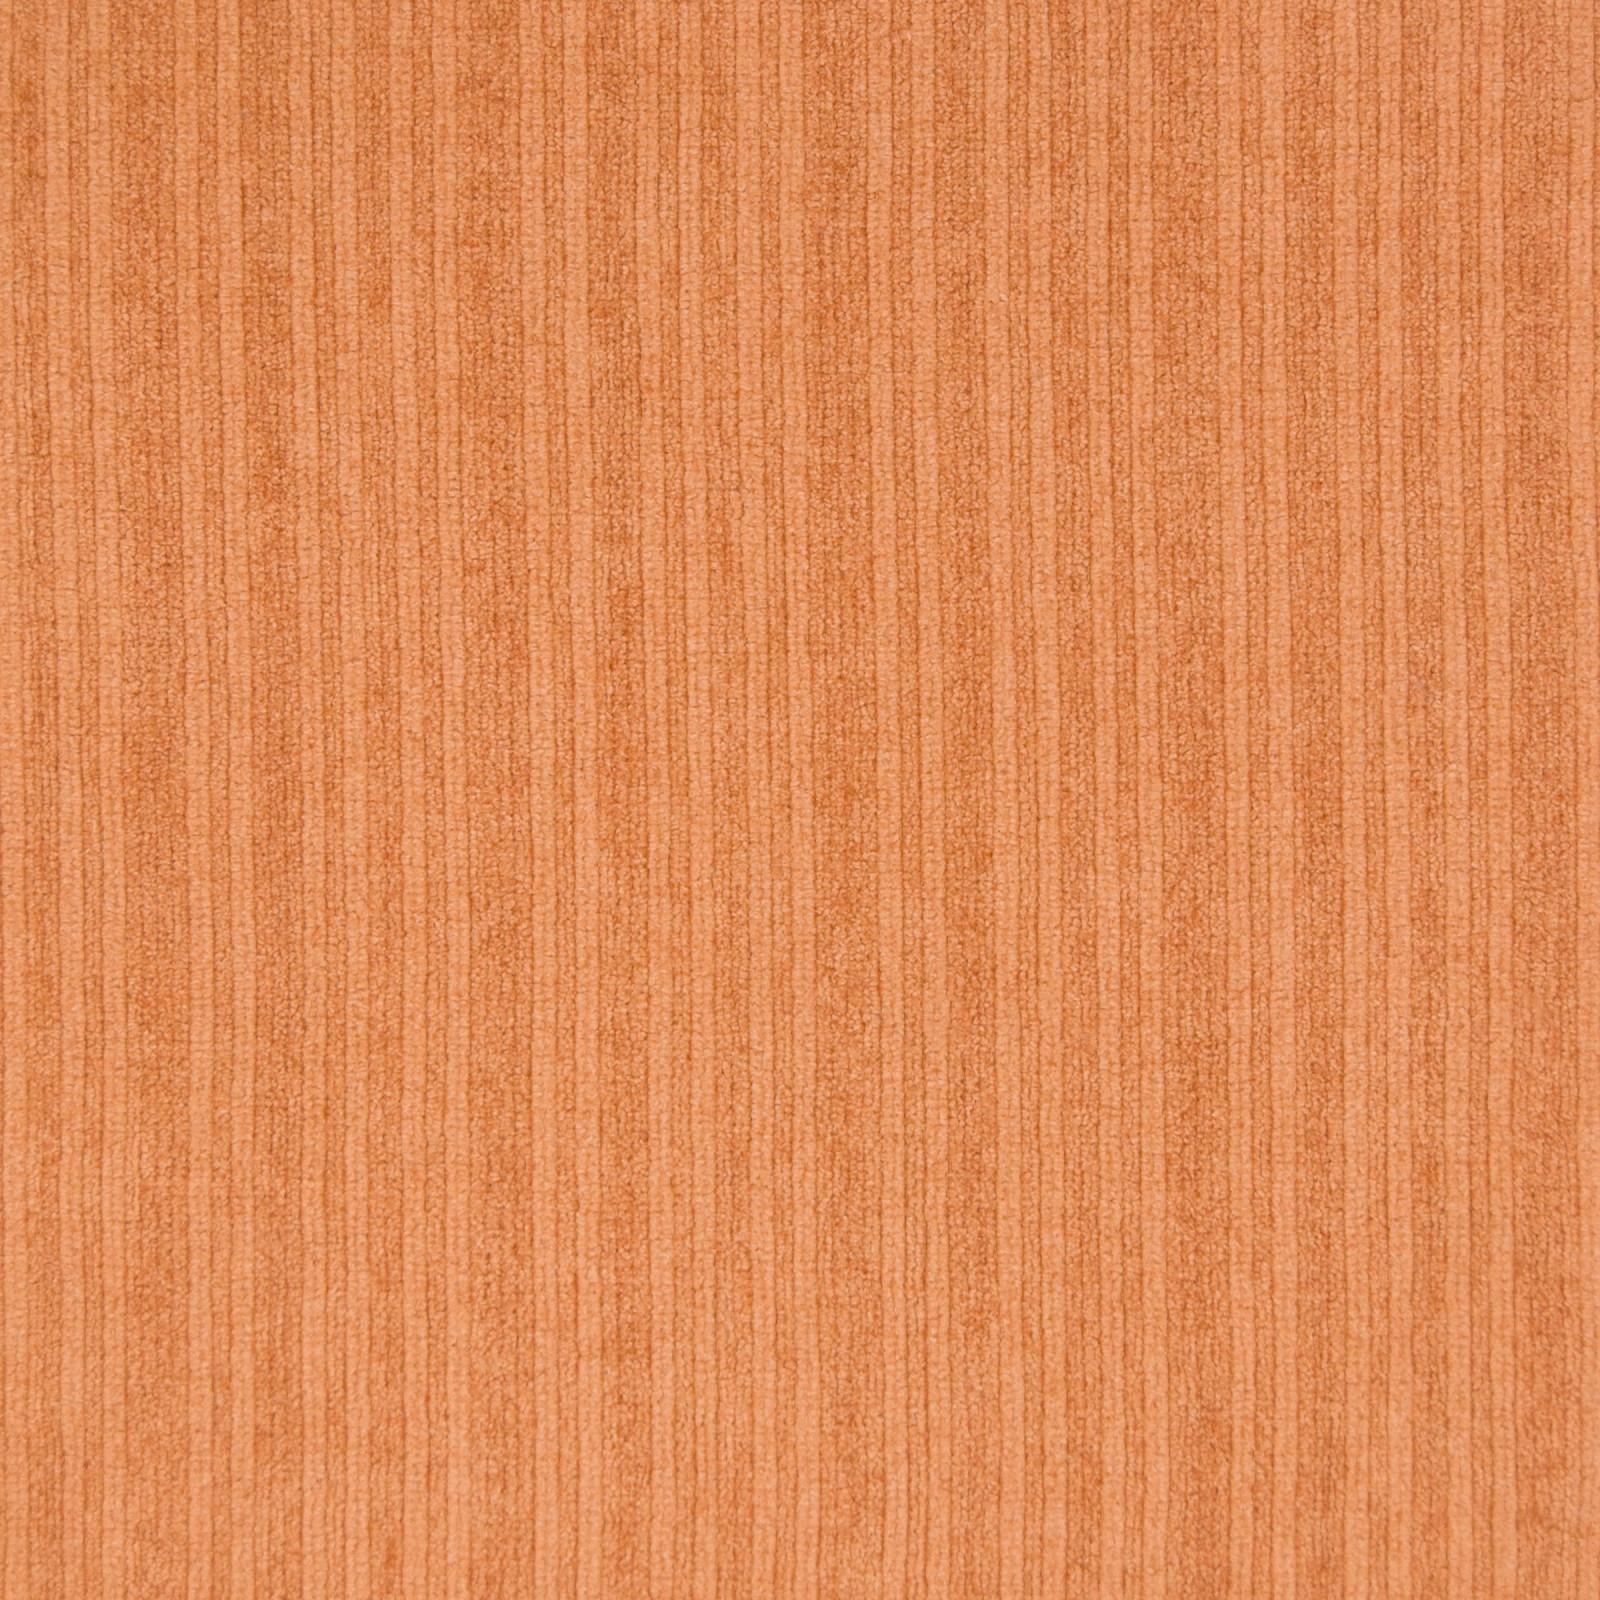 B6977 Burnt Orange Greenhouse Fabrics